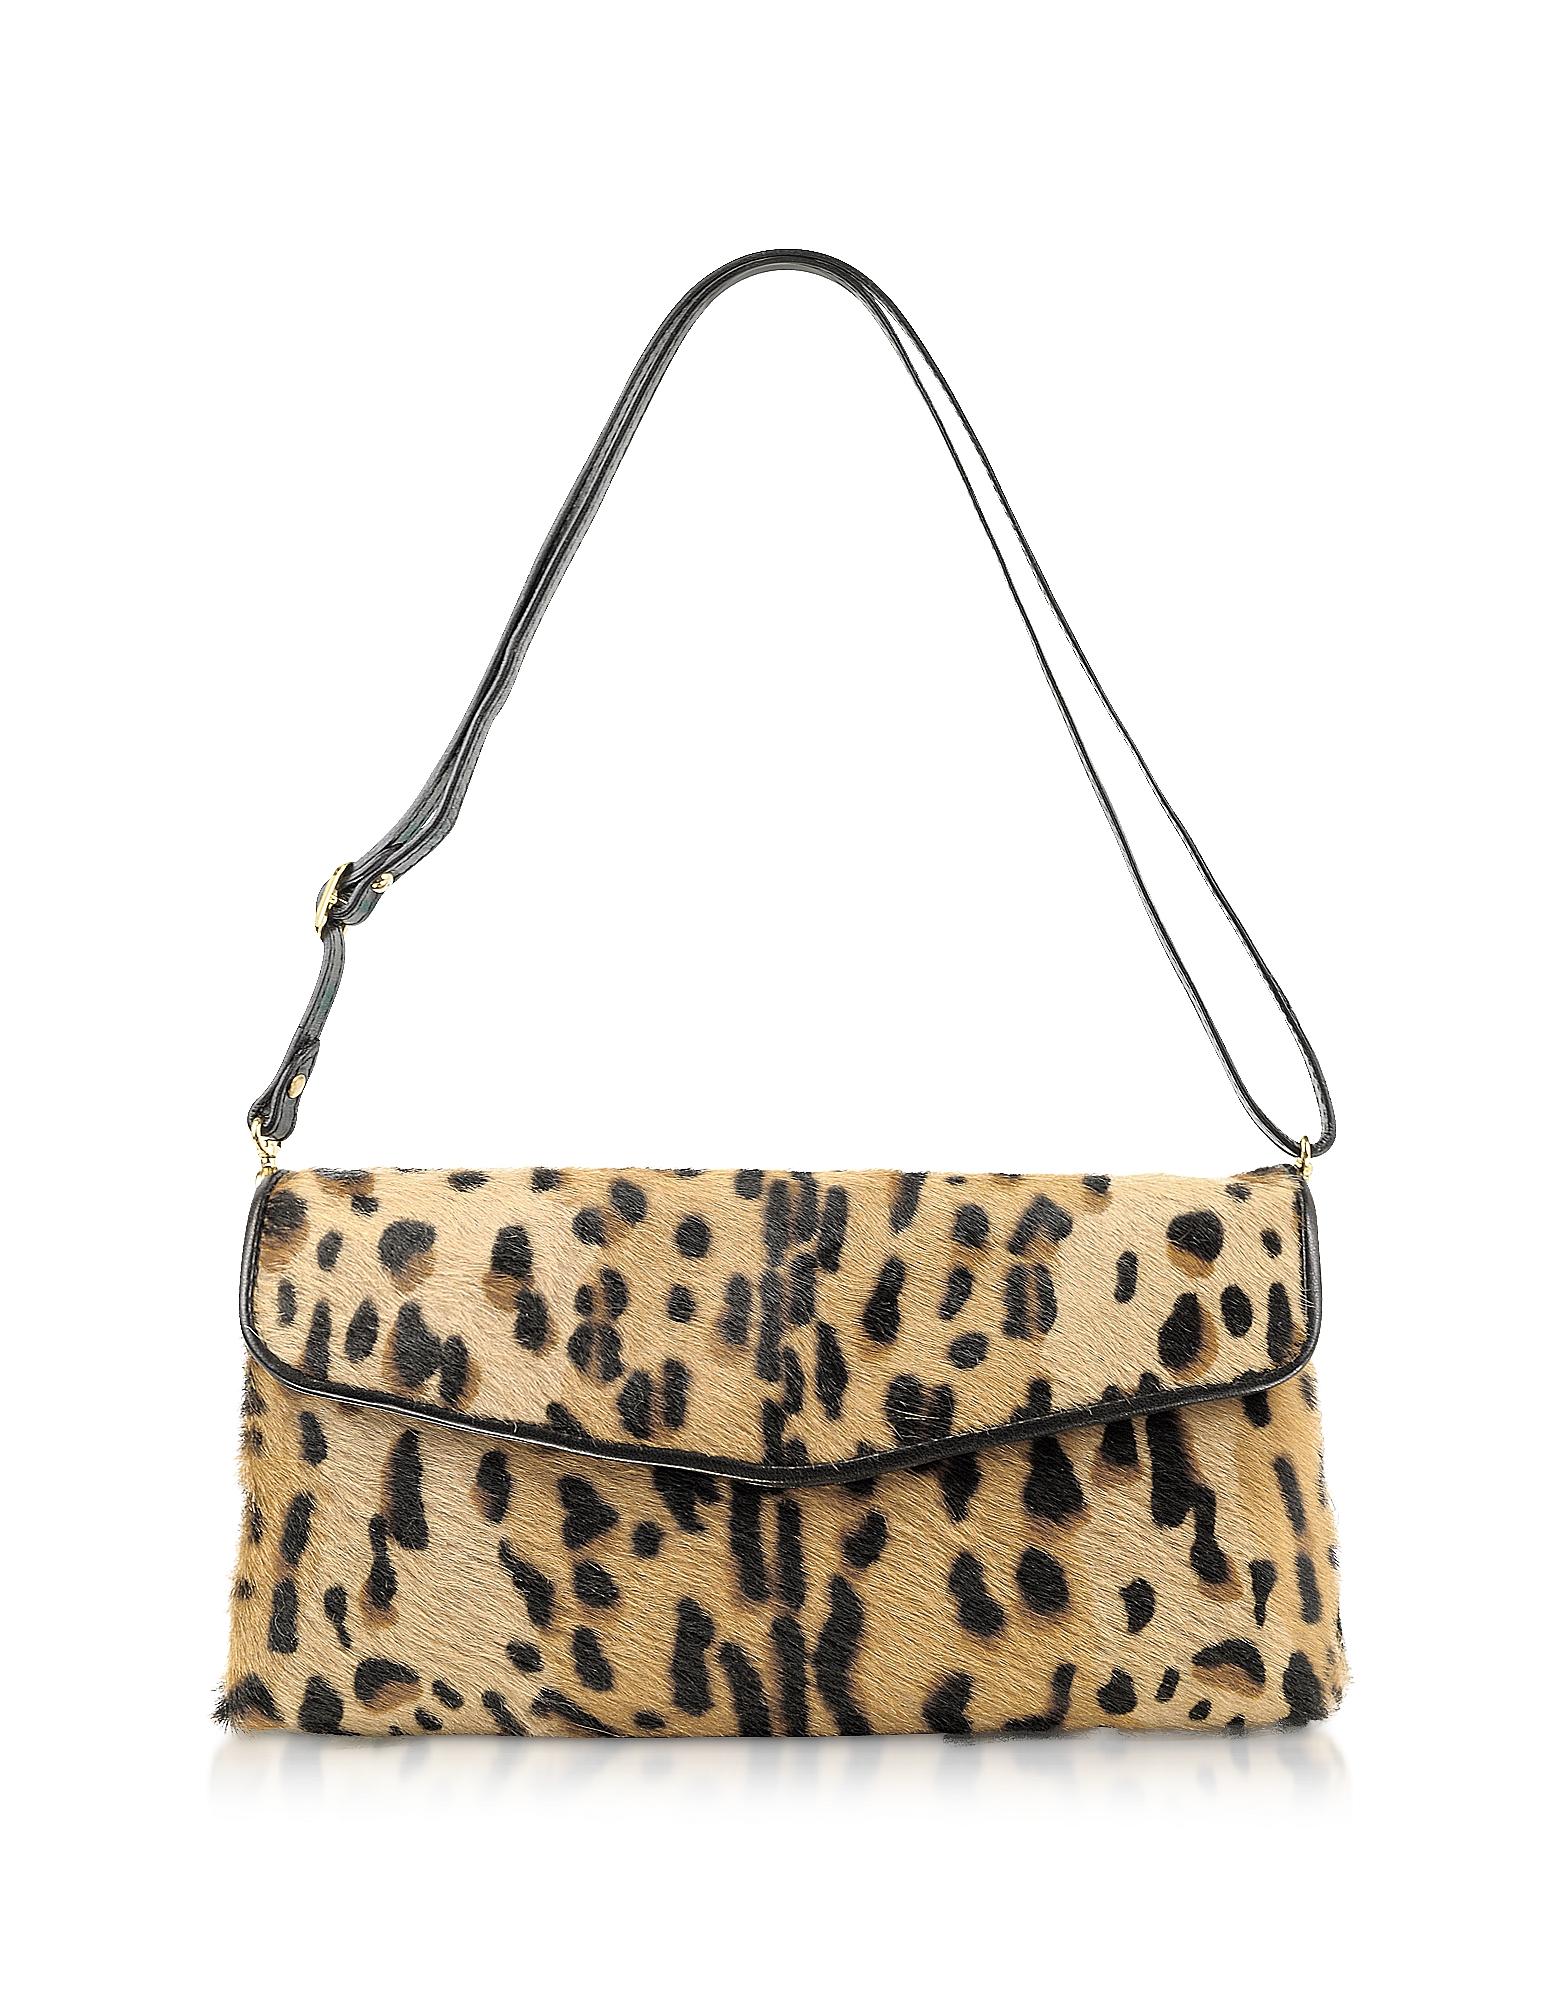 Fontanelli Designer Handbags, Calfhair Leopard Print Shoulder Bag